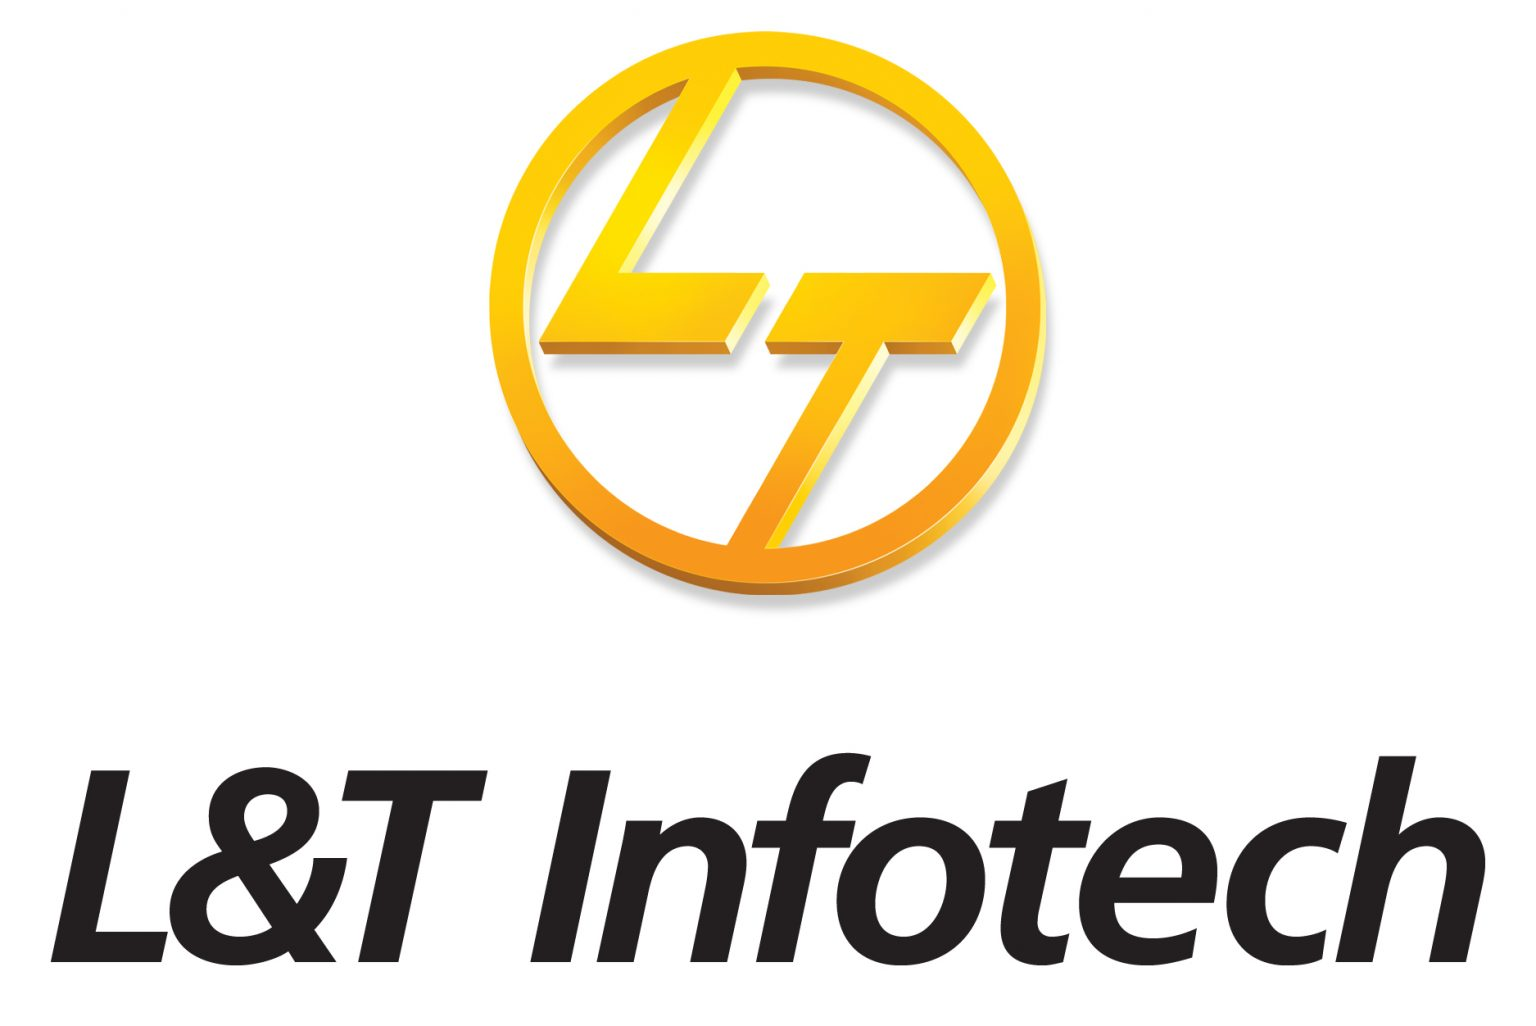 LTI Awarded Snowflake Global Innovation Partner of the Year| എൽടിഐ ഈ വർഷത്തെ സ്നോഫ്ലേക്ക് ഗ്ലോബൽ ഇന്നൊവേഷൻ പാർട്ണർ അവാർഡ് നൽകി_40.1